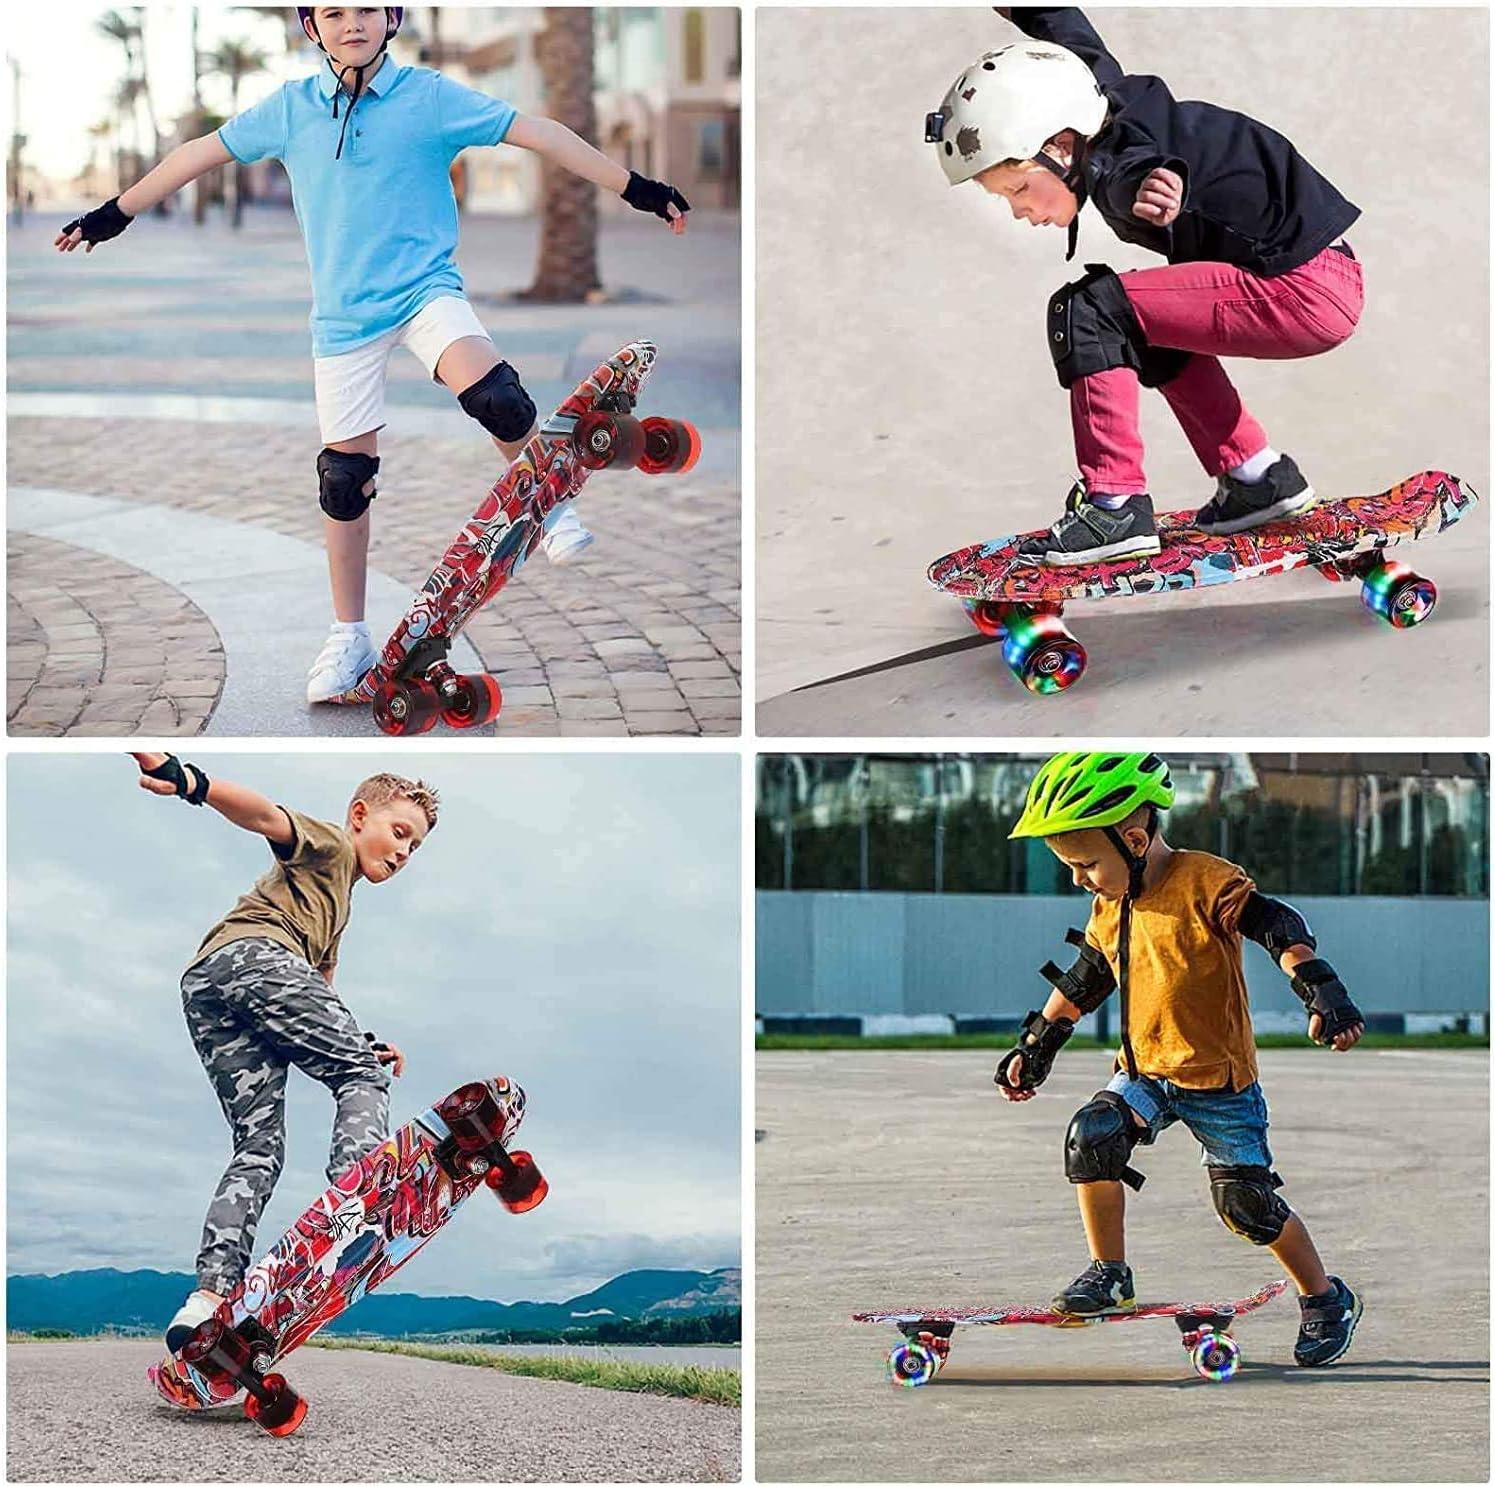 SGODDE Skateboard Komplette 56cm//22 Mini Cruiser Board Retro Komplettboard f/ür Anf/änger Kinder Jugendliche Erwachsene,56x15cm Komplett Board mit ABEC-11 Kugellager,LED PU Leuchtrollen,T-Tool